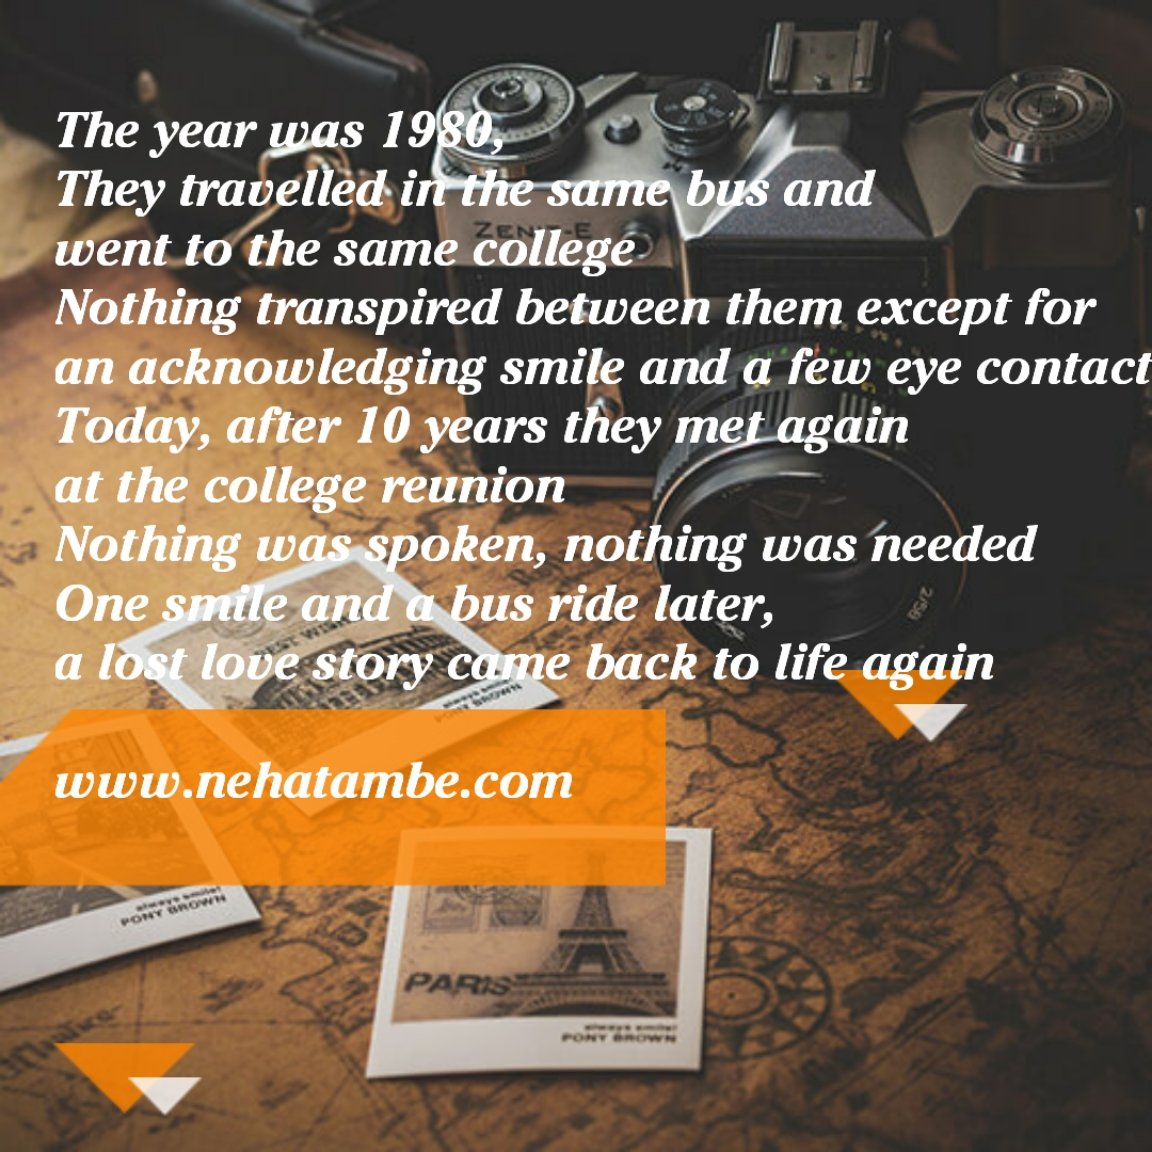 #Tiniature #TGITF #Travel #LoveStory #iamwriting #BeingAuthor #TinyStory #tinystories #microstories #tinytales #amwriting #Blogchatter https://t.co/e8XKSZKkYU